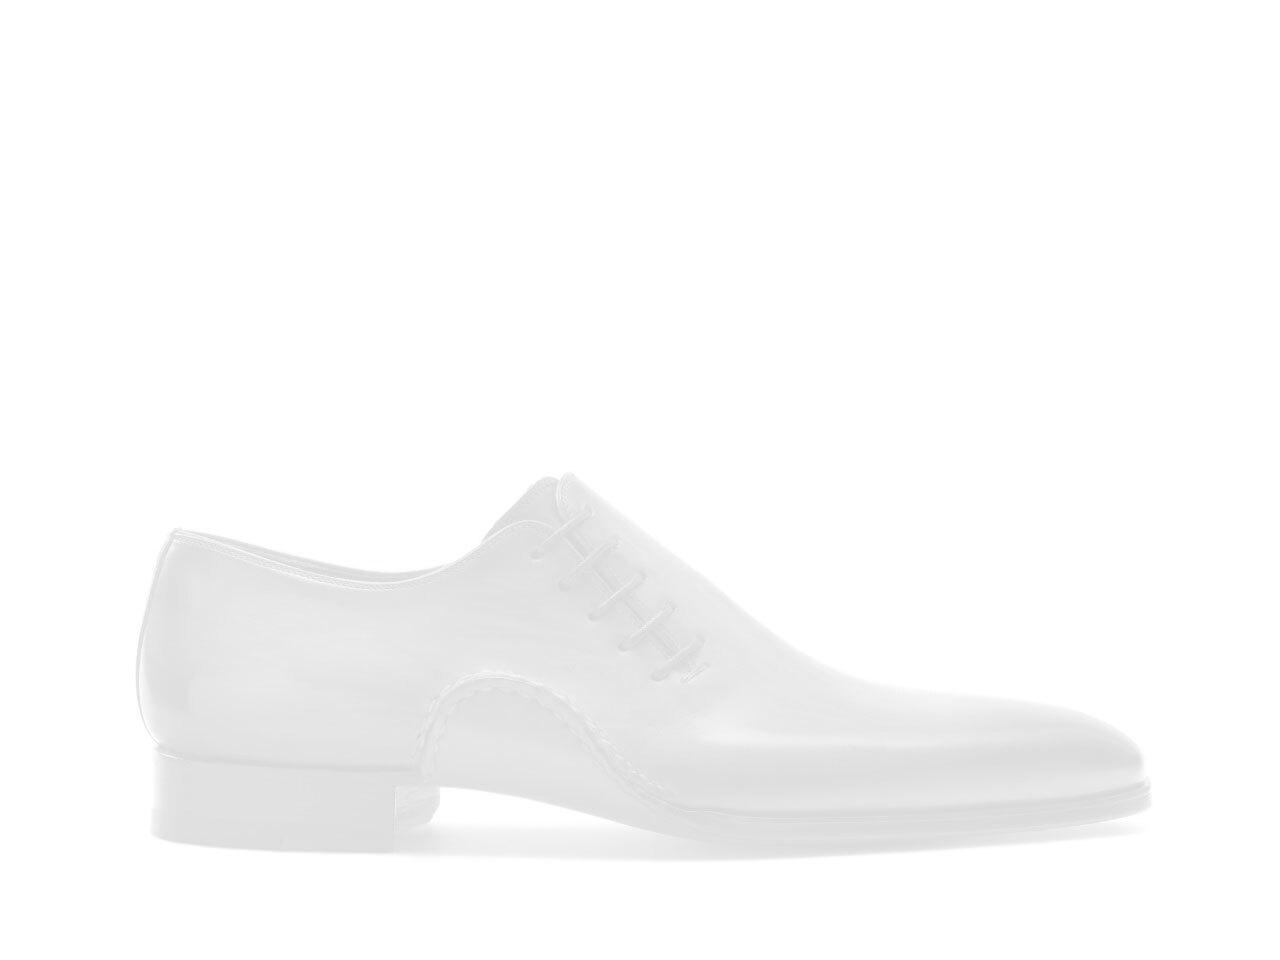 Sole of the Magnanni Selaya Grey Men's Sneakers